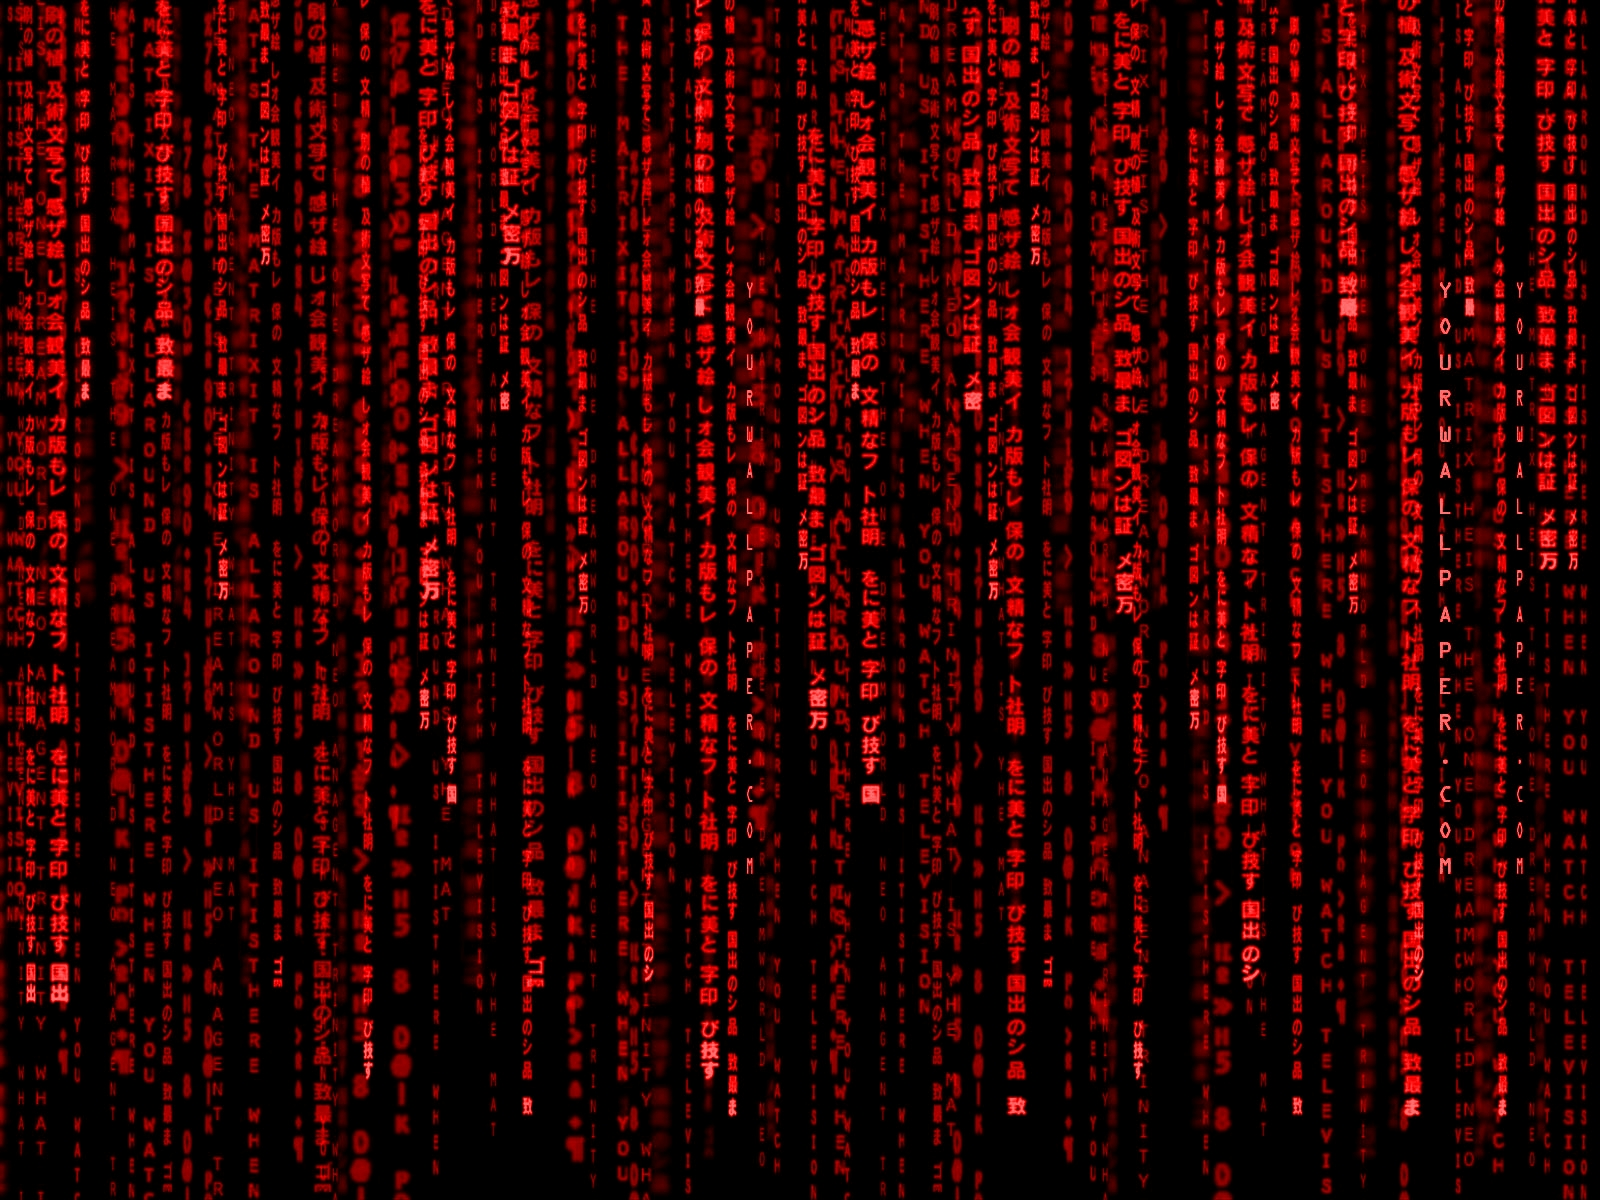 Download Red Matrix Wallpaper 1600x1200 Wallpoper 414229 1600x1200